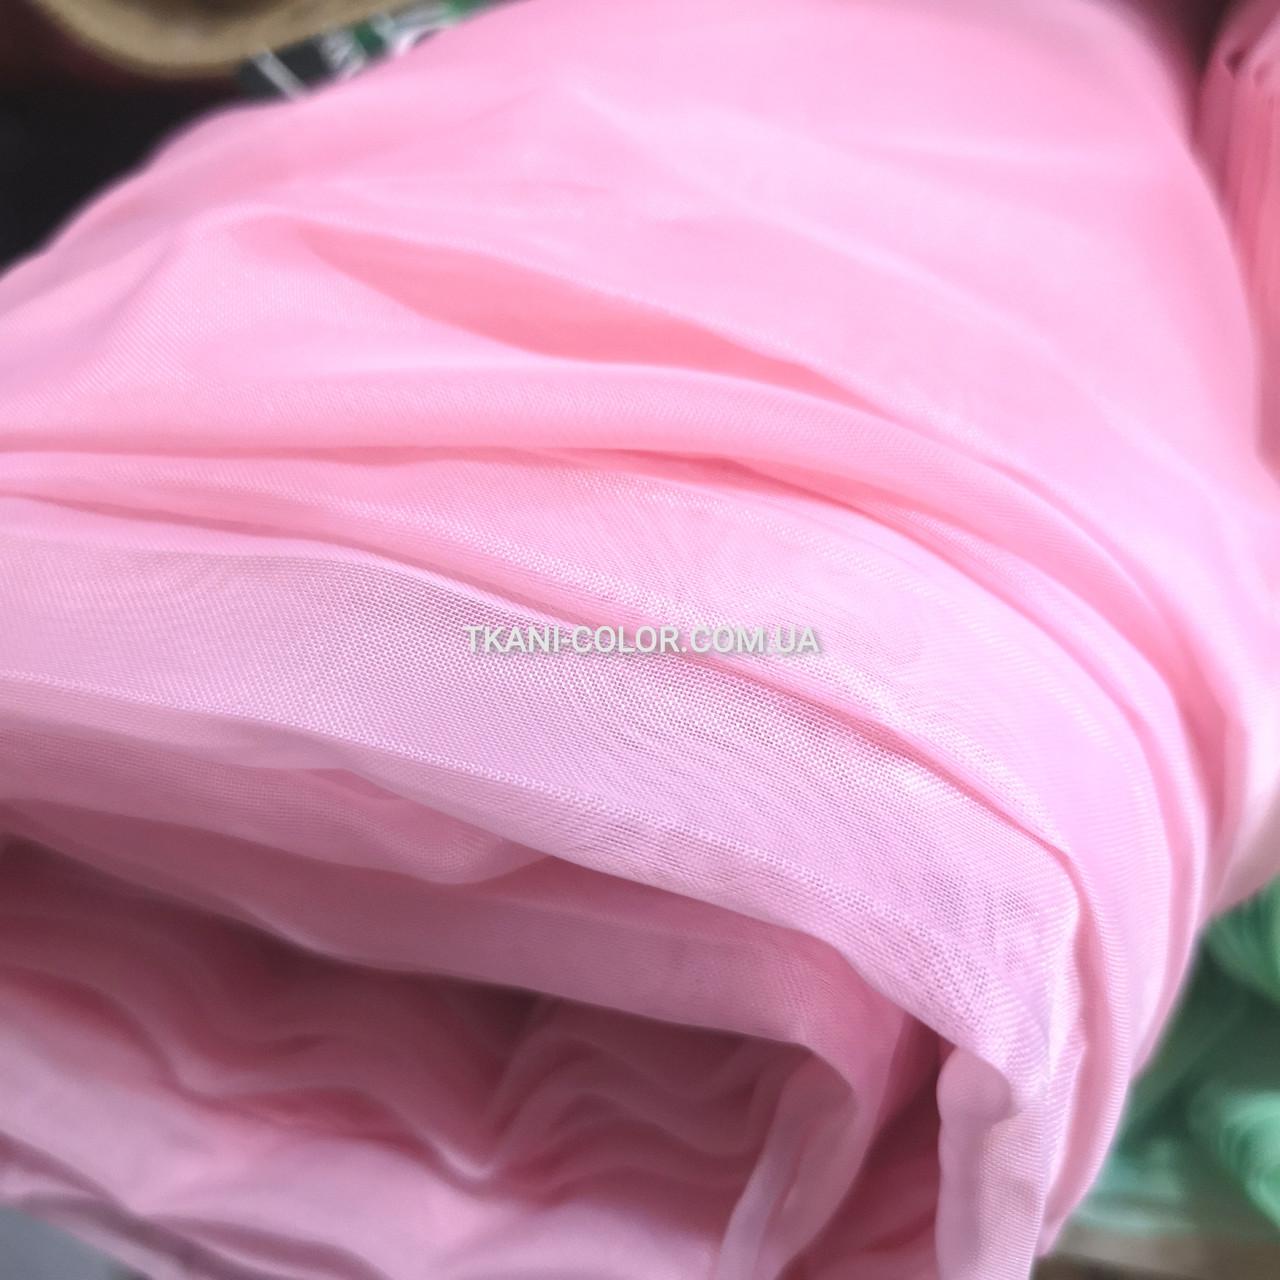 Ткань шифон для штор розовый